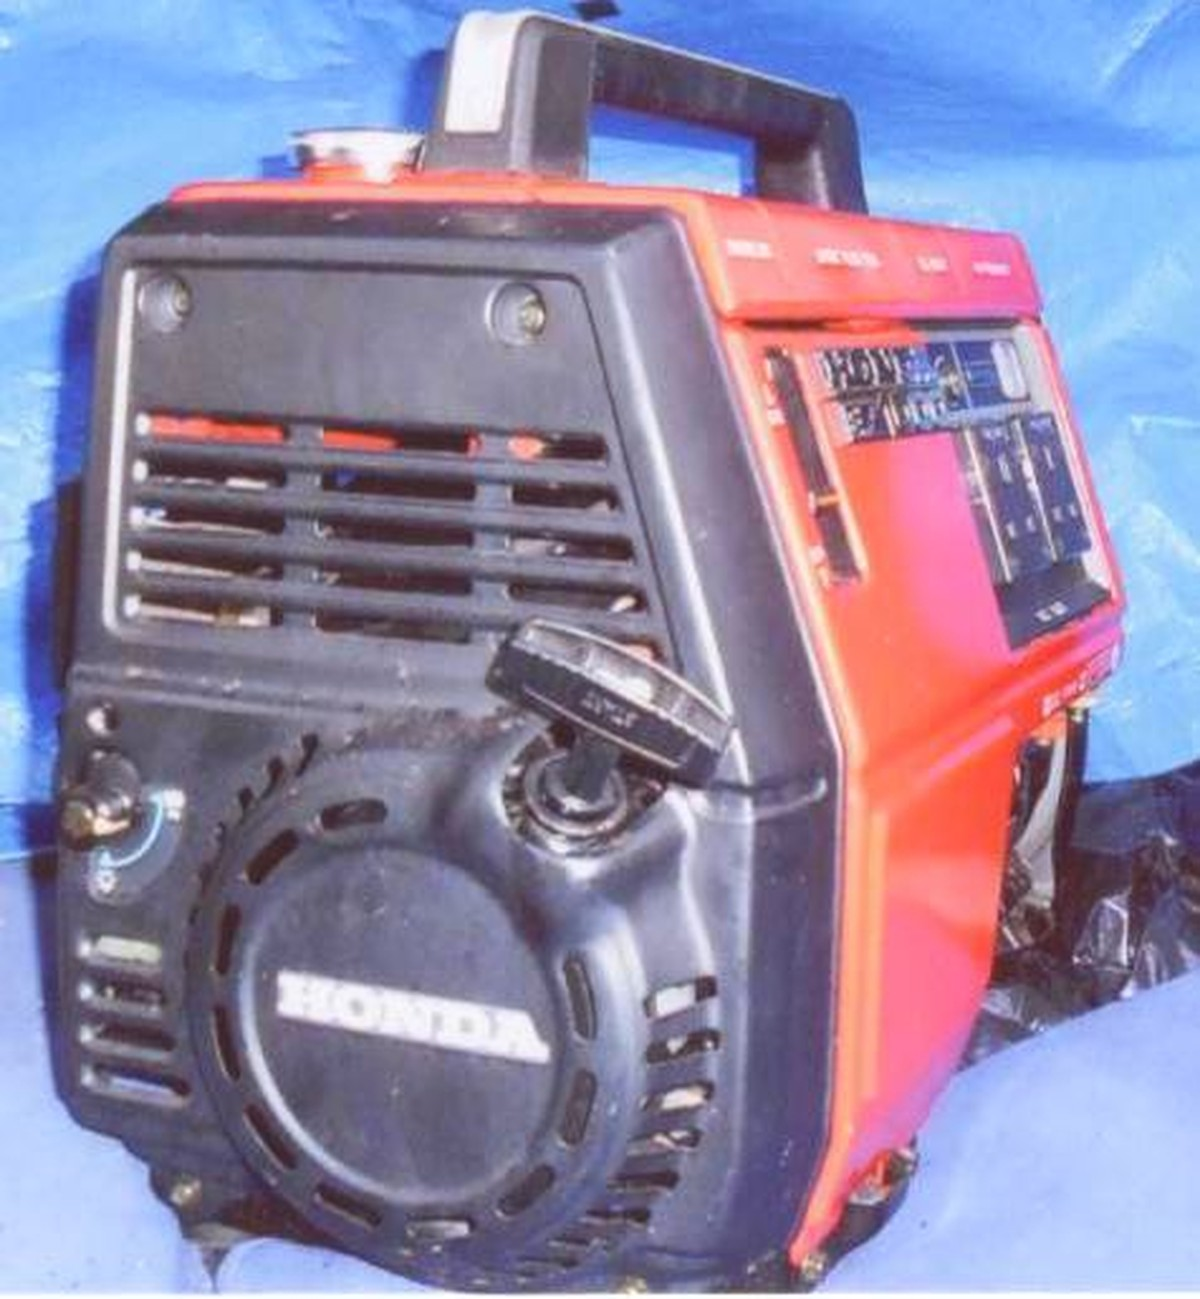 Honda EX1000 Petrol Generator Second hand Honda EX1000 Honda EX1000